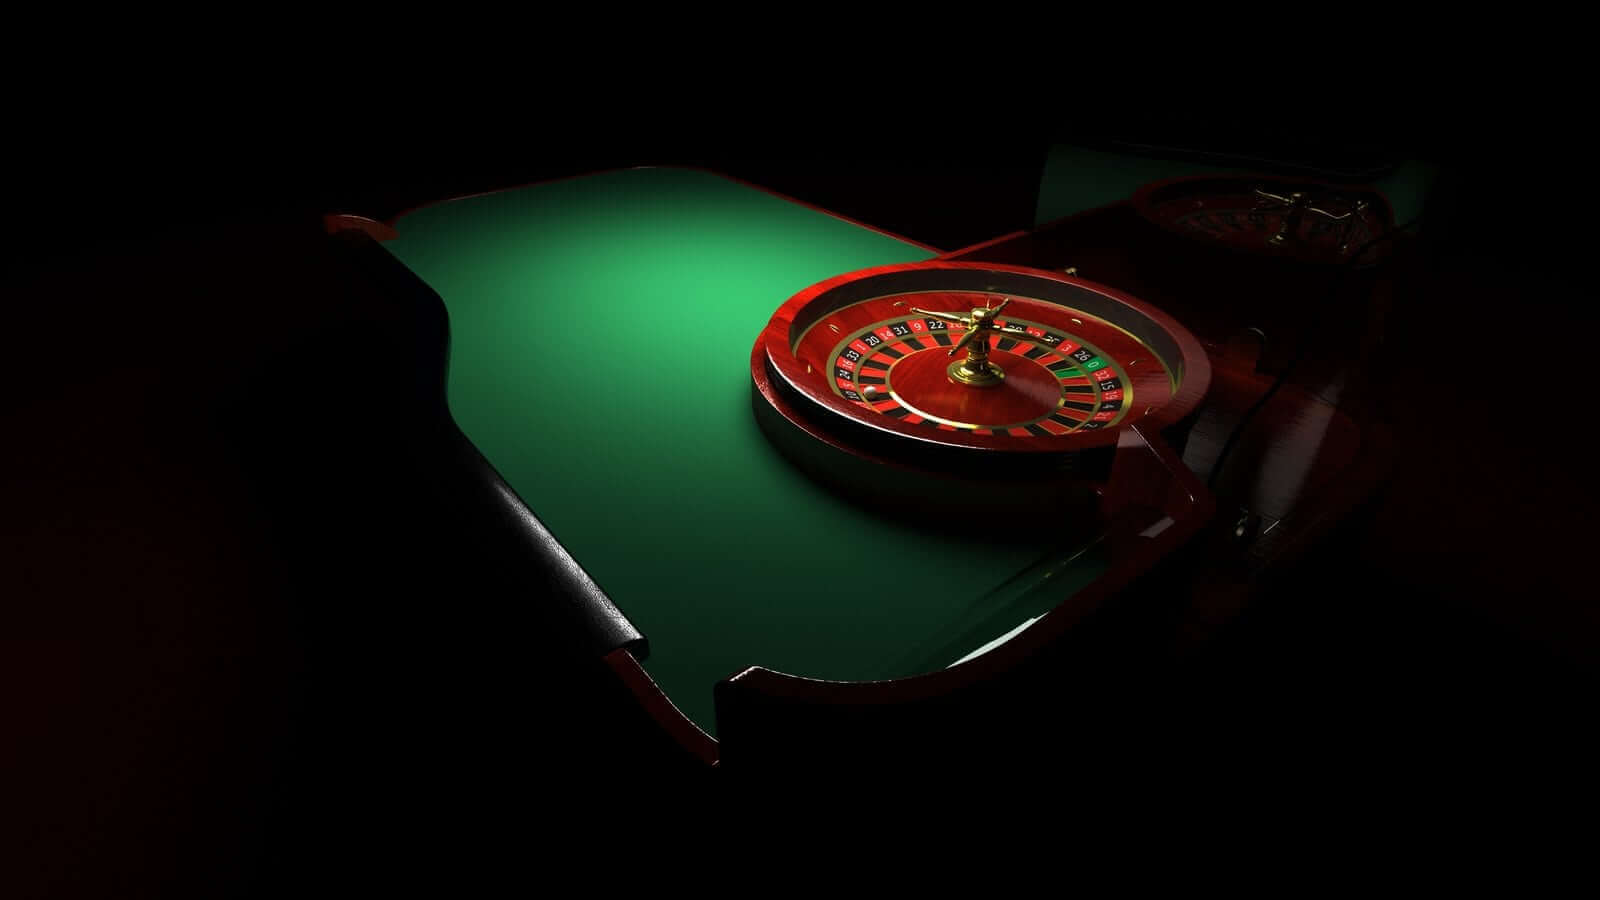 Juega Ruleta Europea Online en Casino.com Argentina